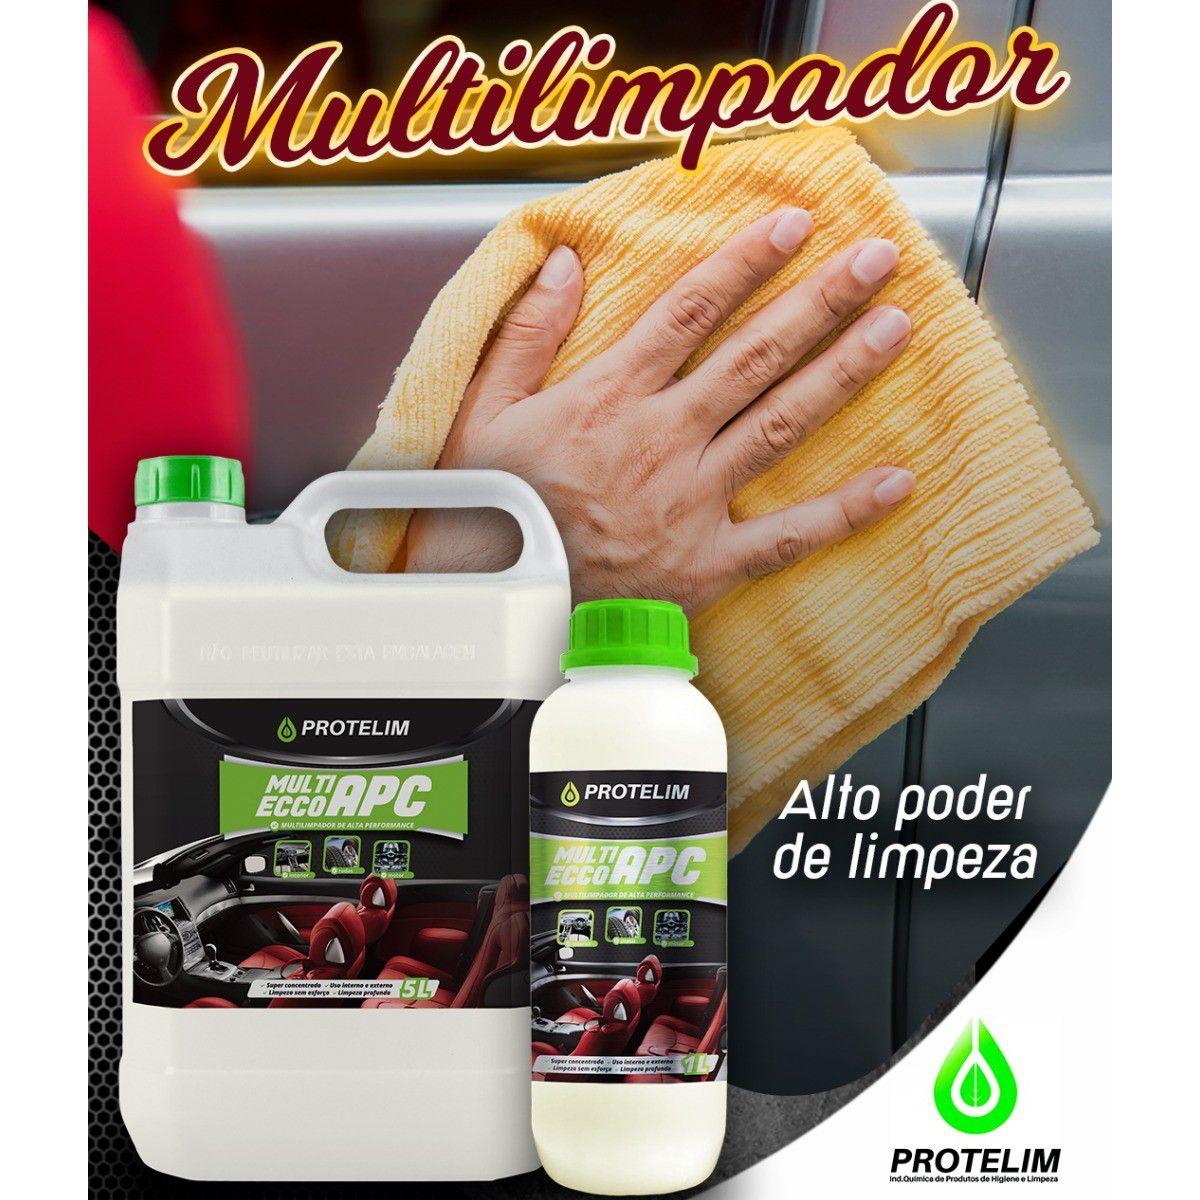 APC Concentrado + 3 Escovas Roda (BRINDE Escova Carpete)